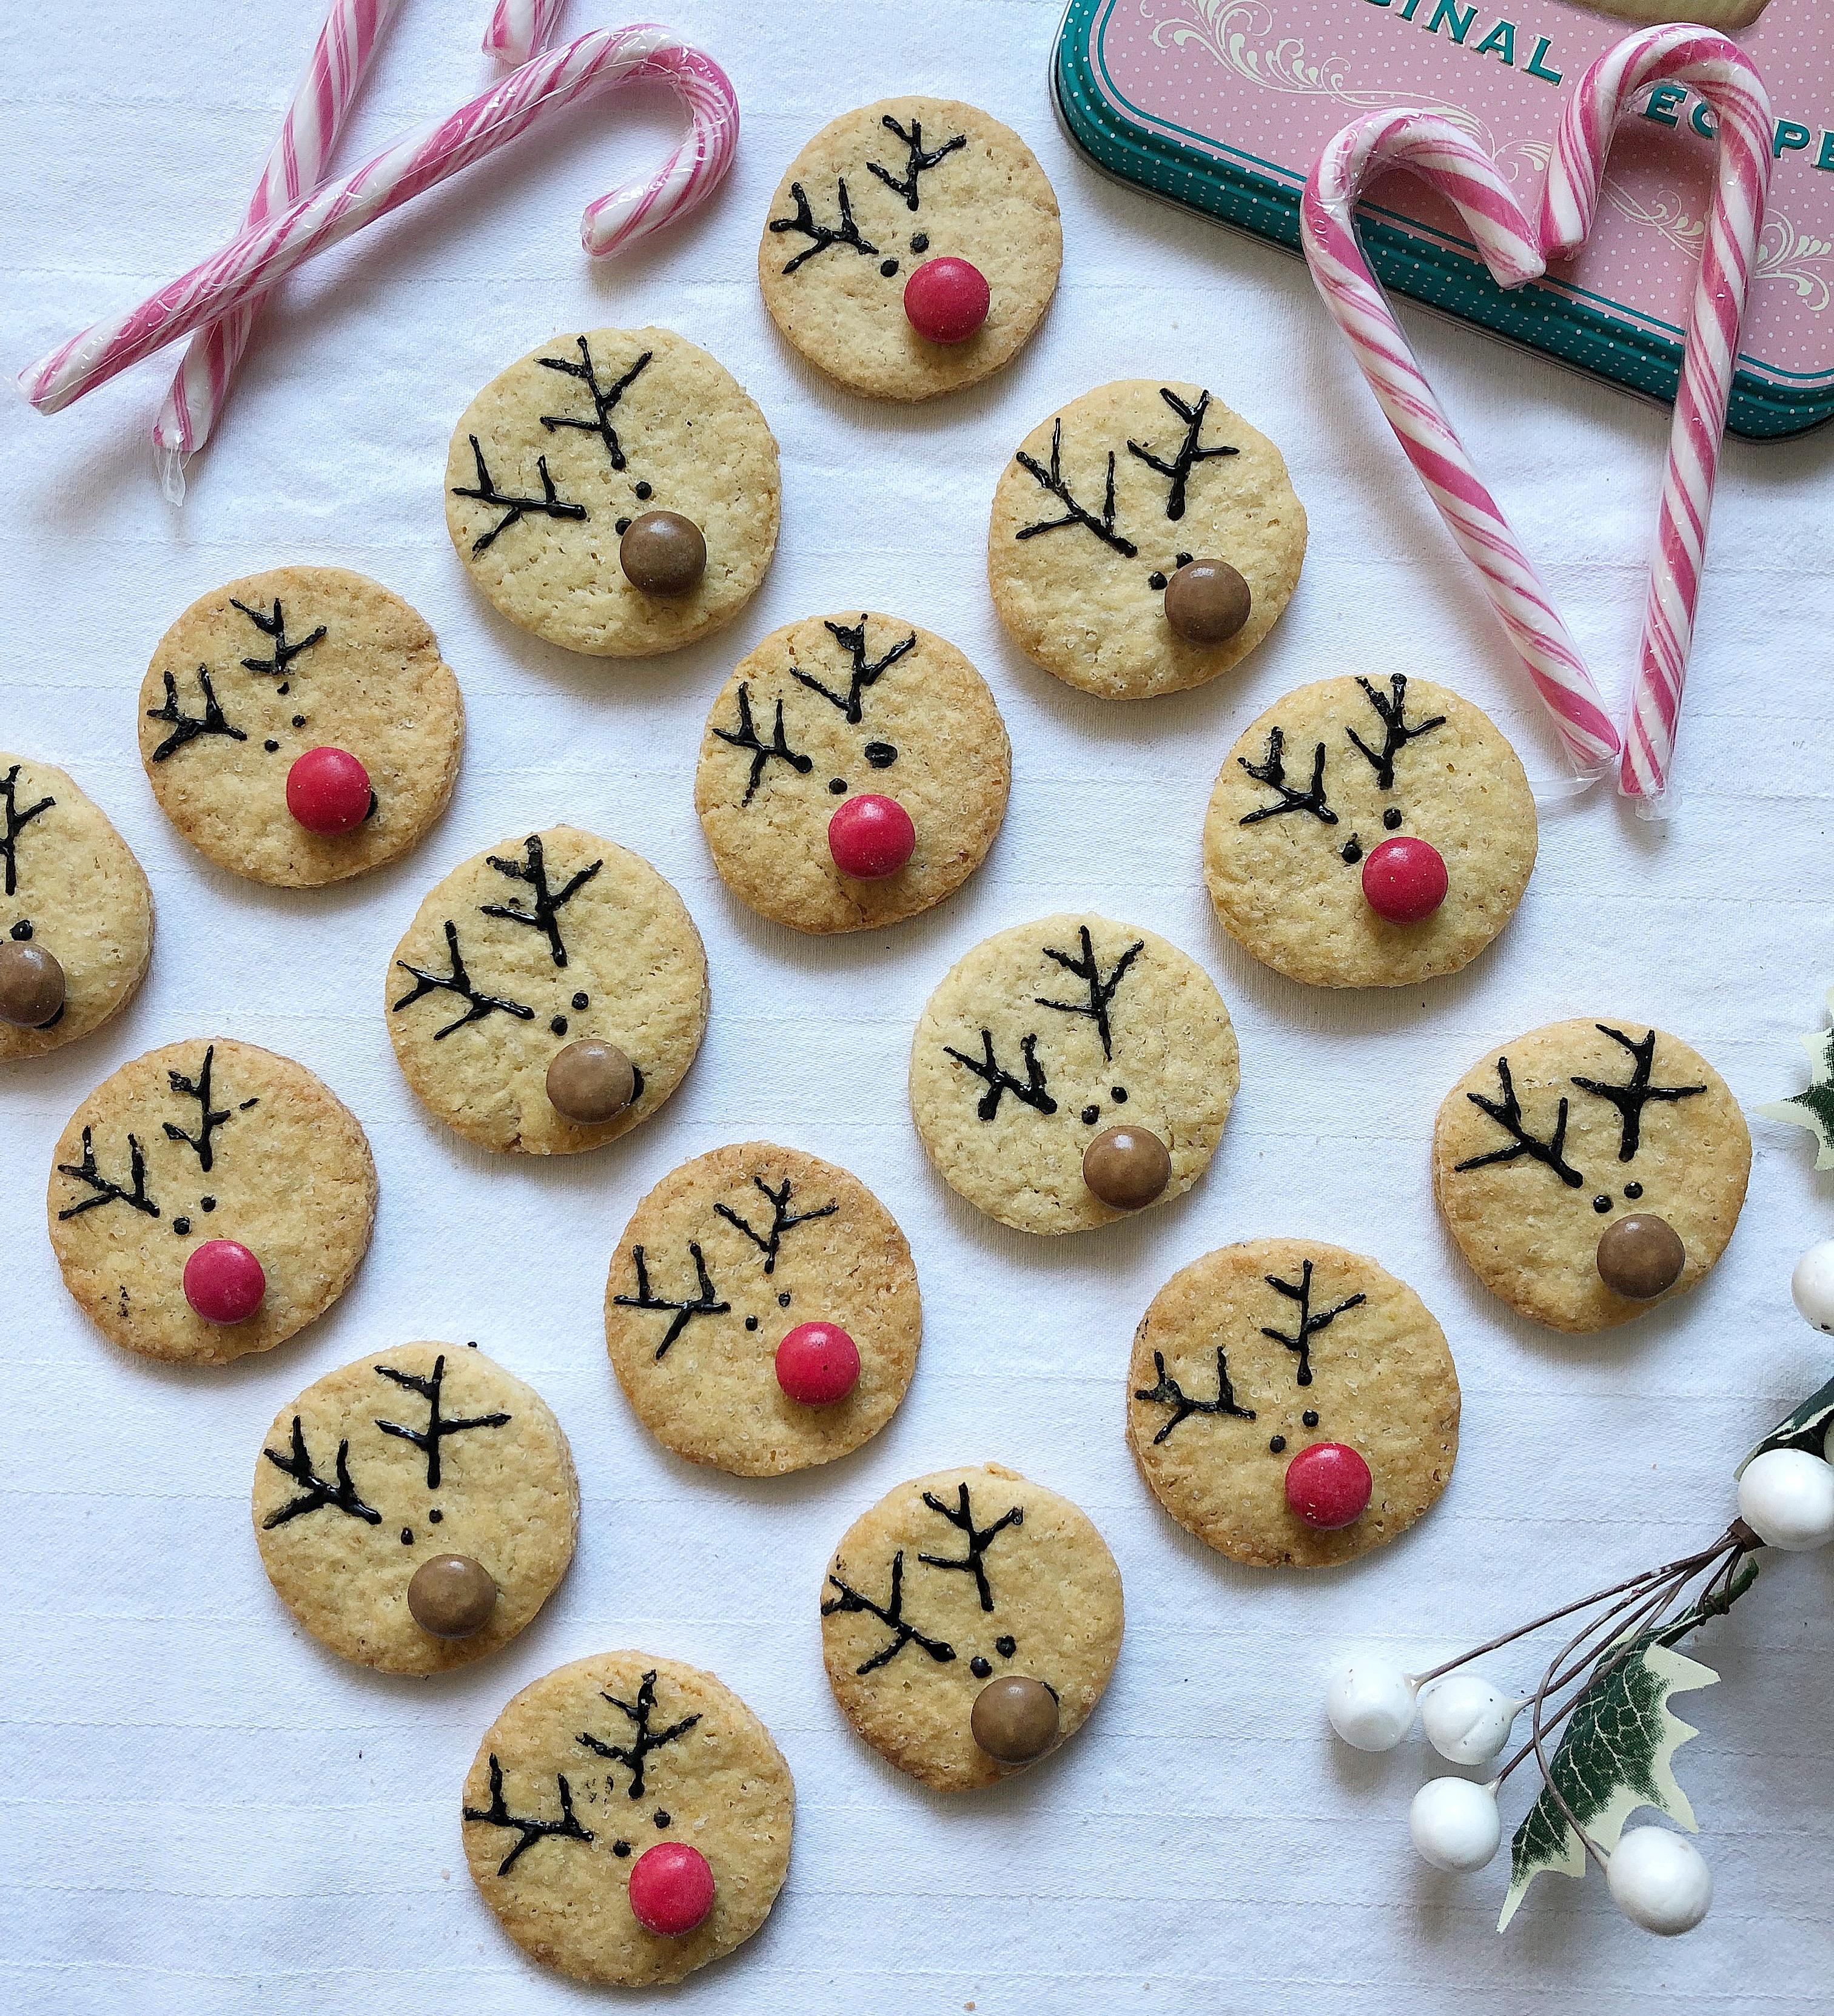 Biscotti Renna Senza Burro, i simpatici biscotti di Natale di dolci senza burro